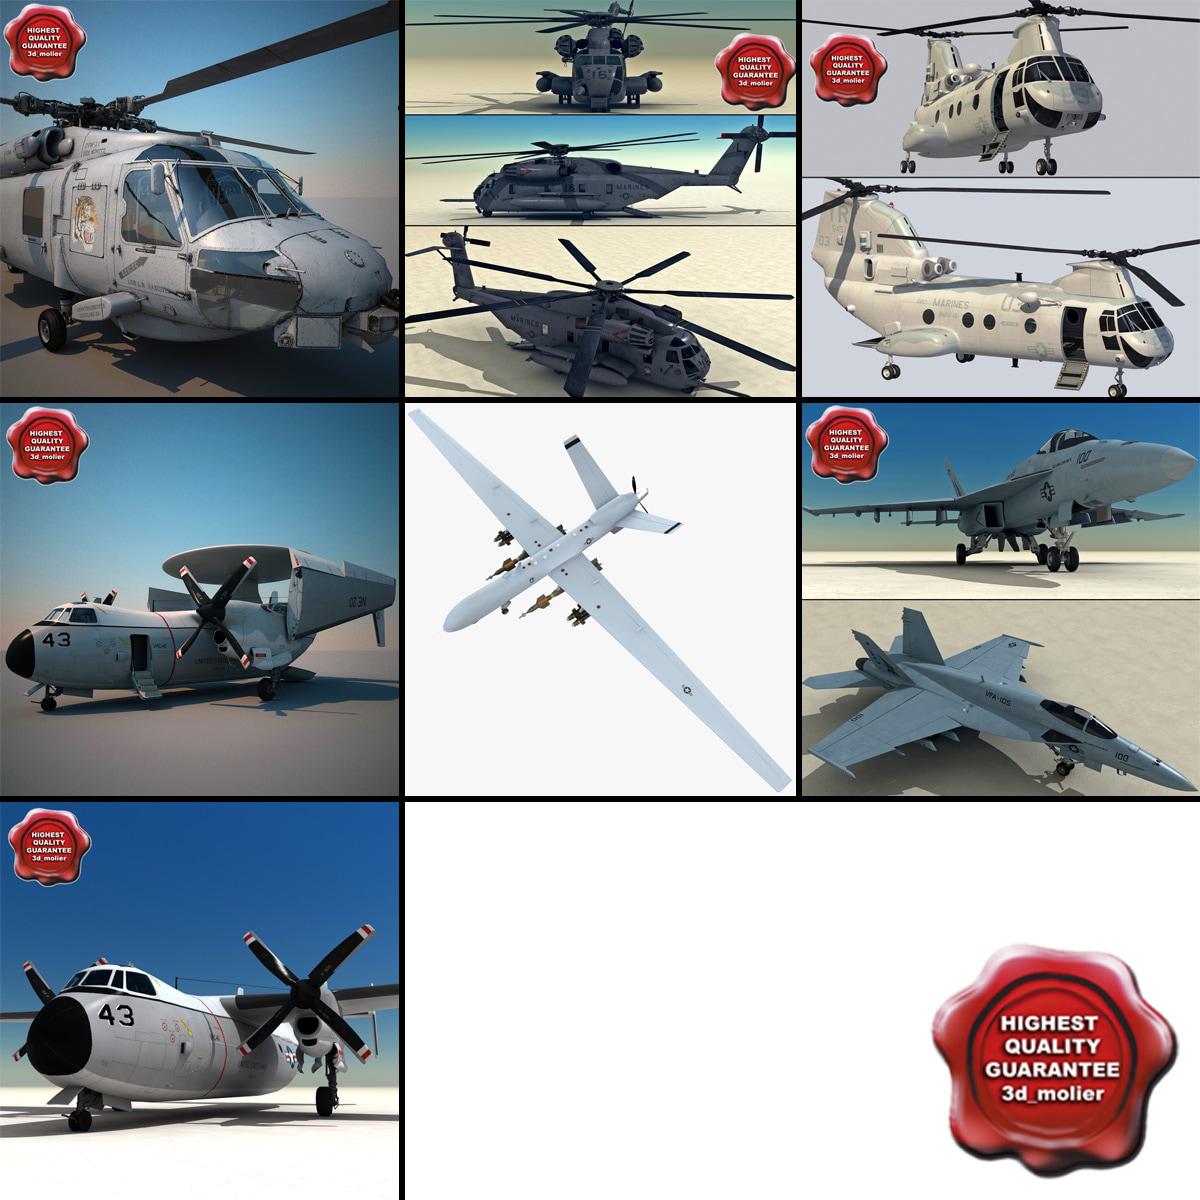 US_Navy_Aircraft_Collection_V2_000.jpg